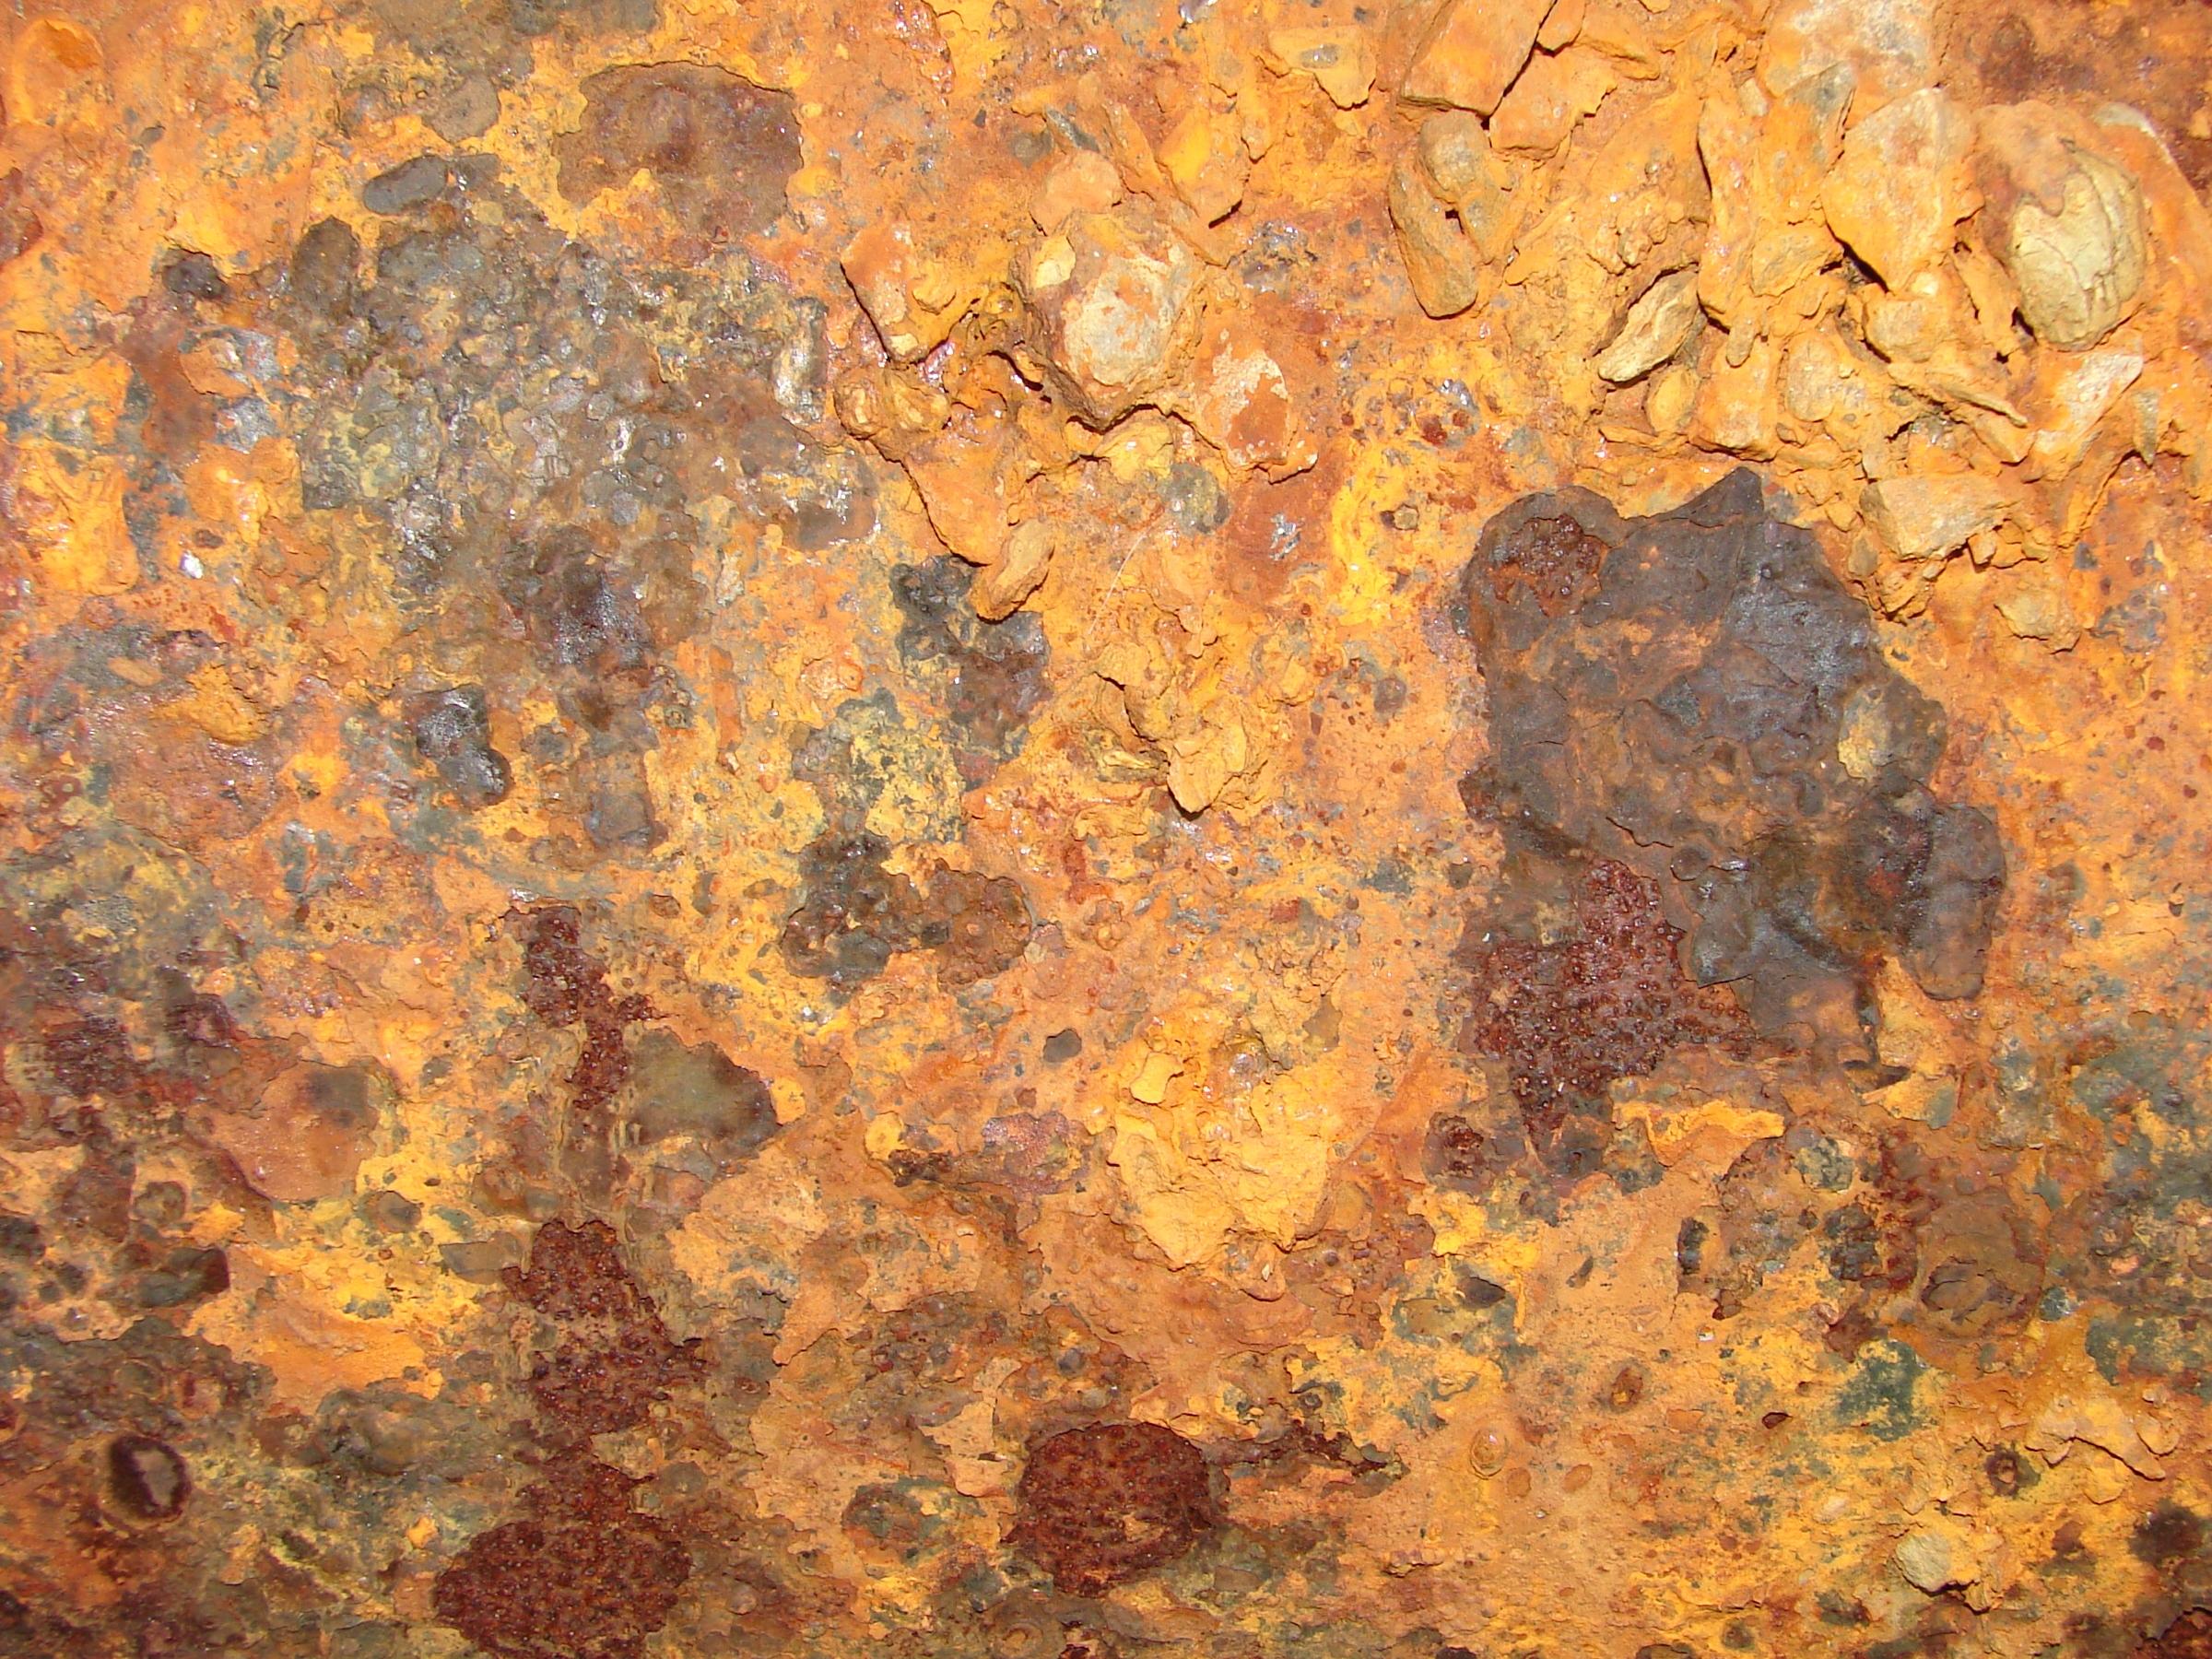 Metal Rust Texture 05 by FantasyStock on DeviantArt